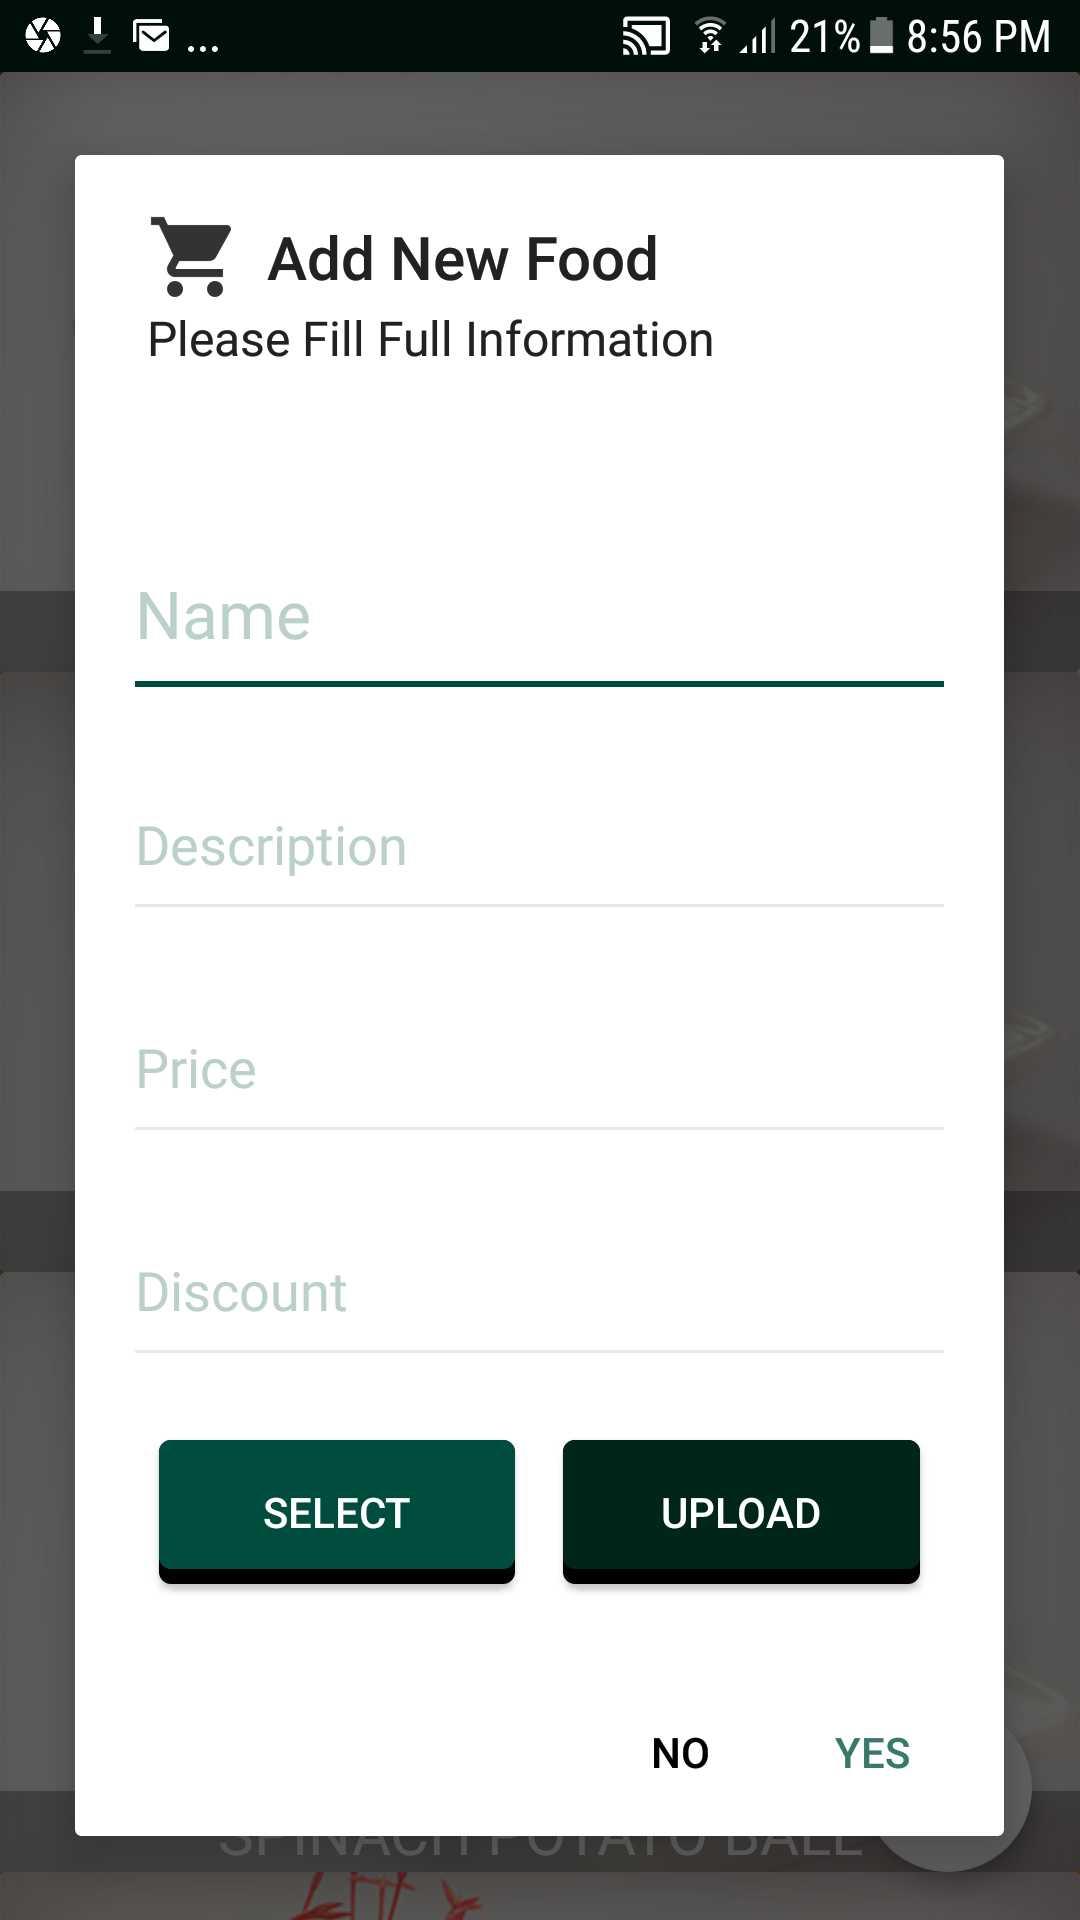 GitHub - osamamohsen/Android-Restaurant-Admin